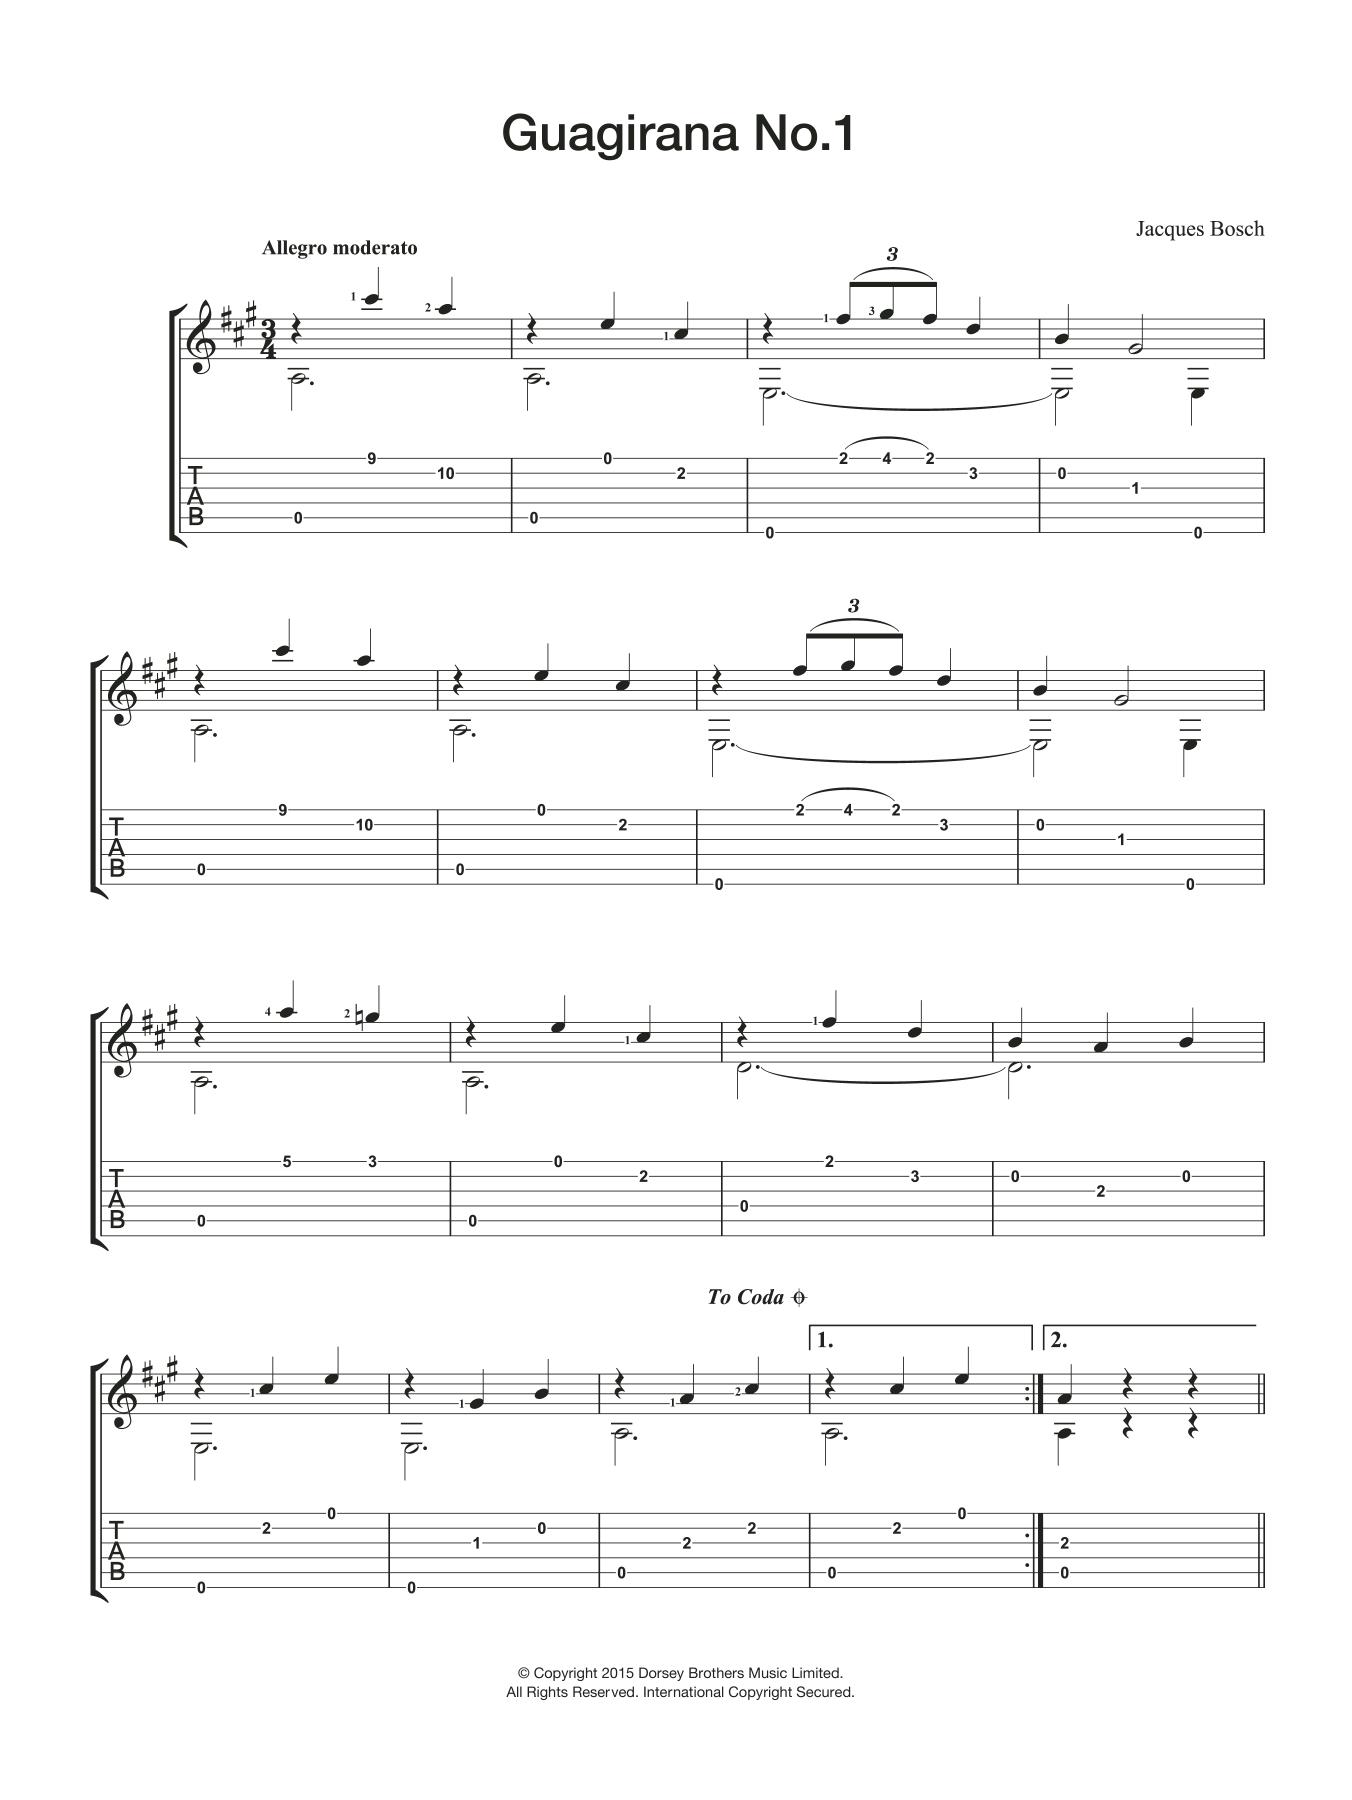 Guagirana No. 1 Sheet Music